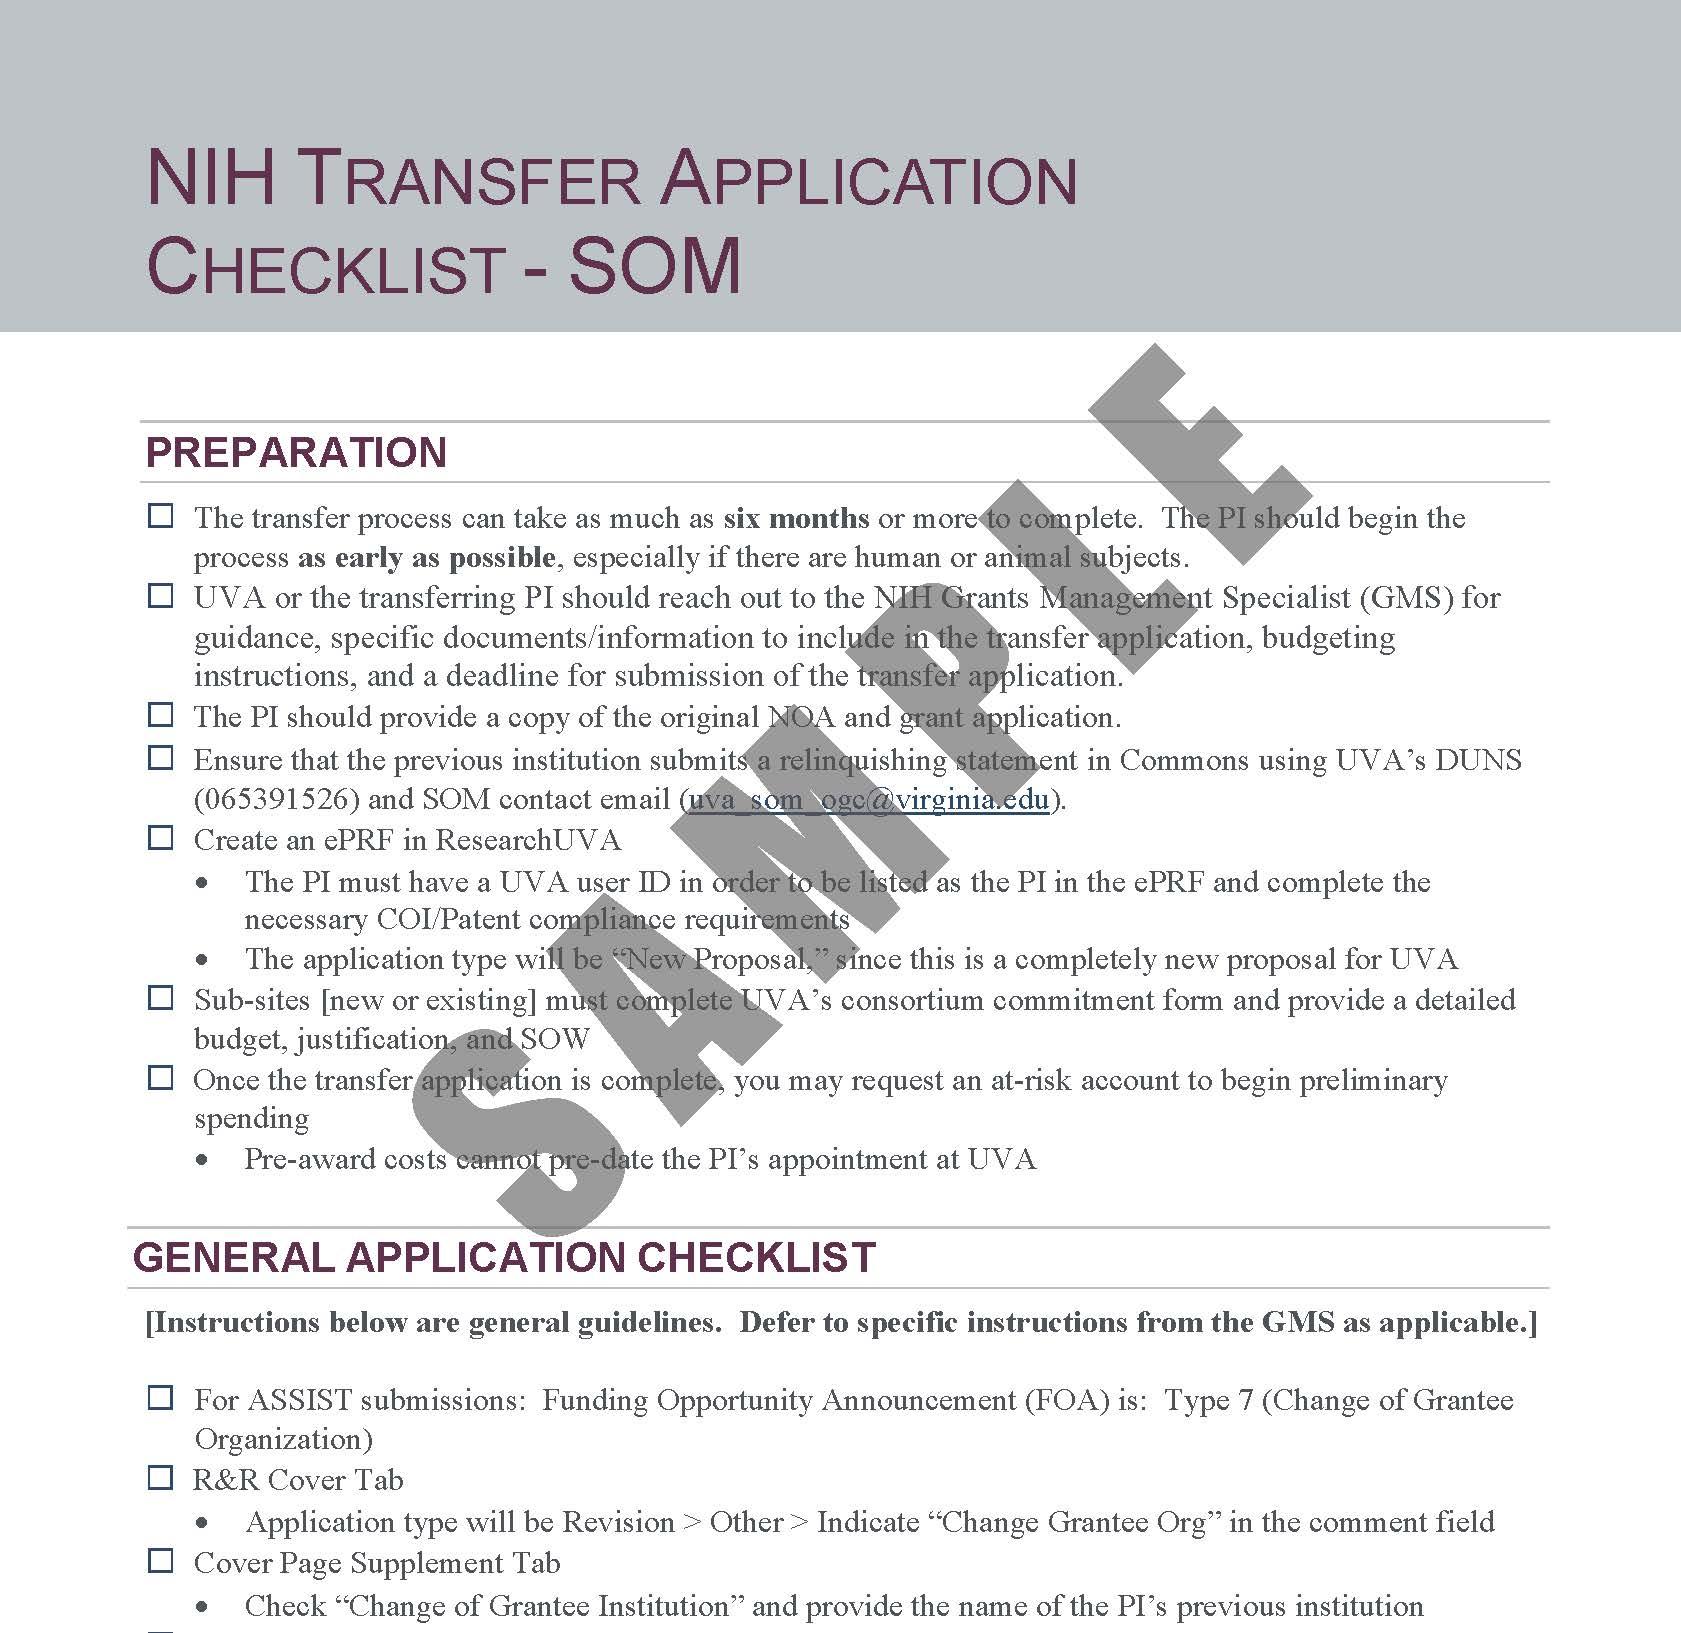 NIH Transfer Application Checklist